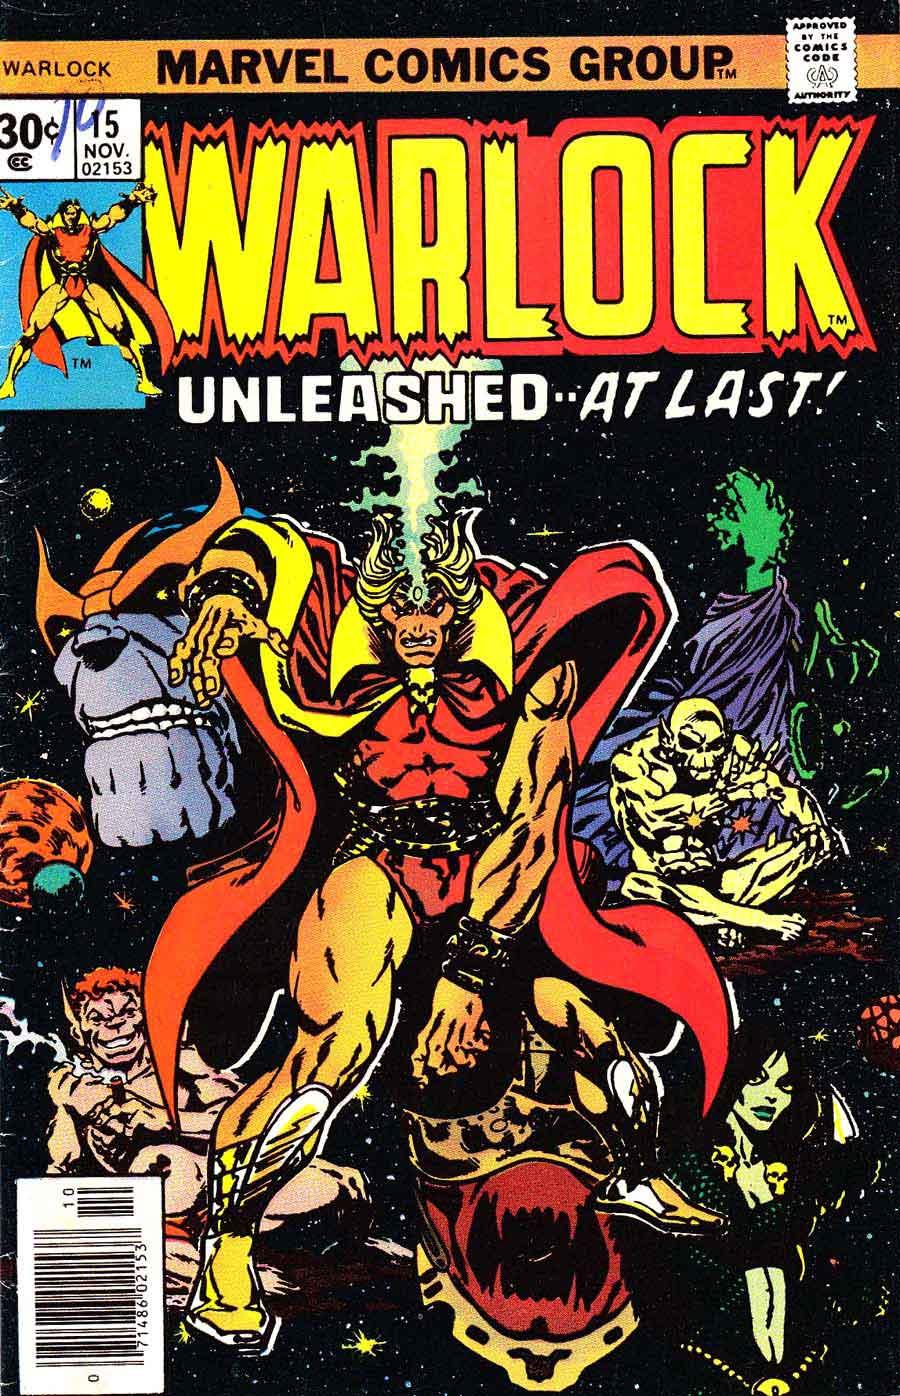 Warlock v1 #15 marvel 1970s bronze age comic book cover art by Jim Starlin